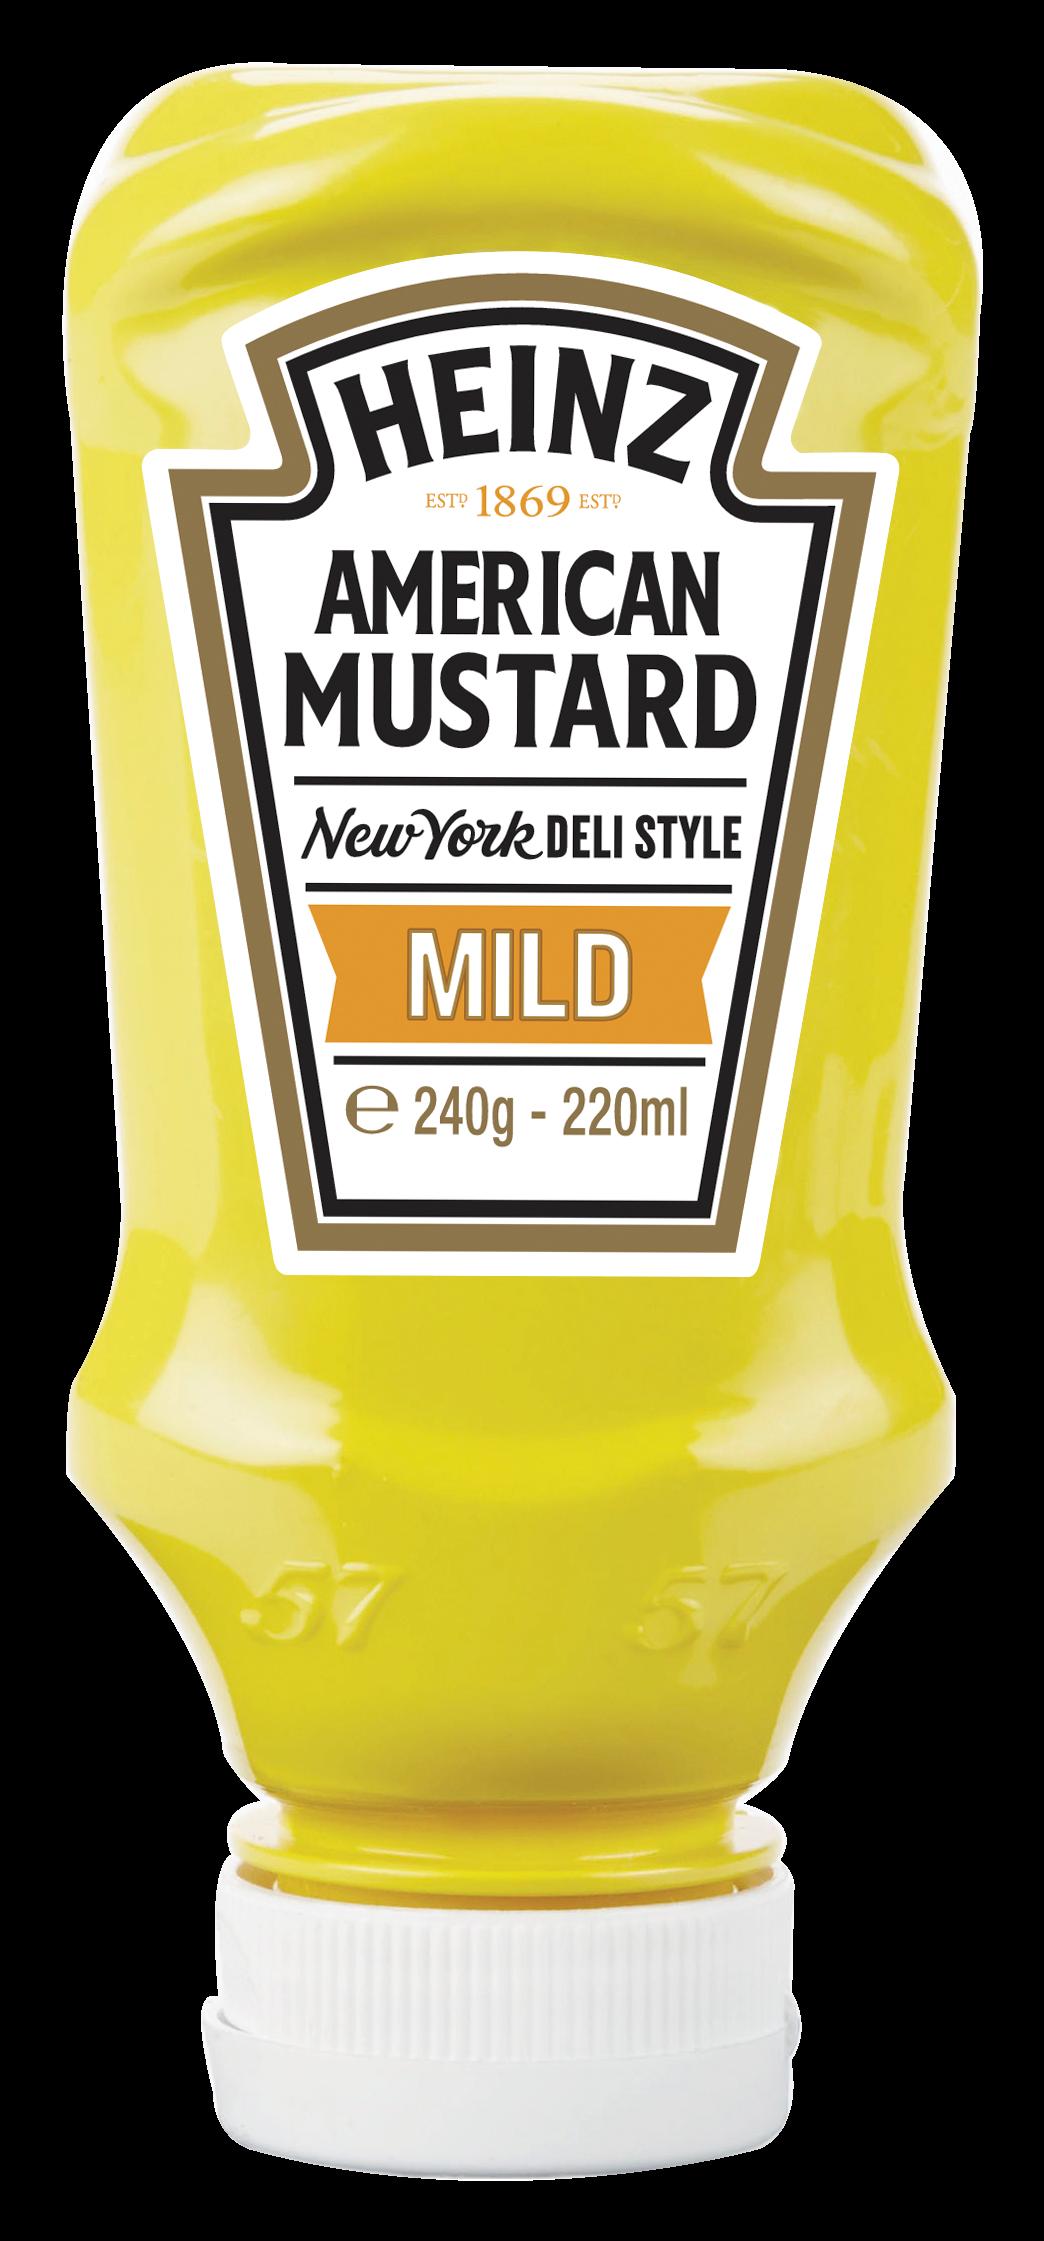 American Mustard Mild